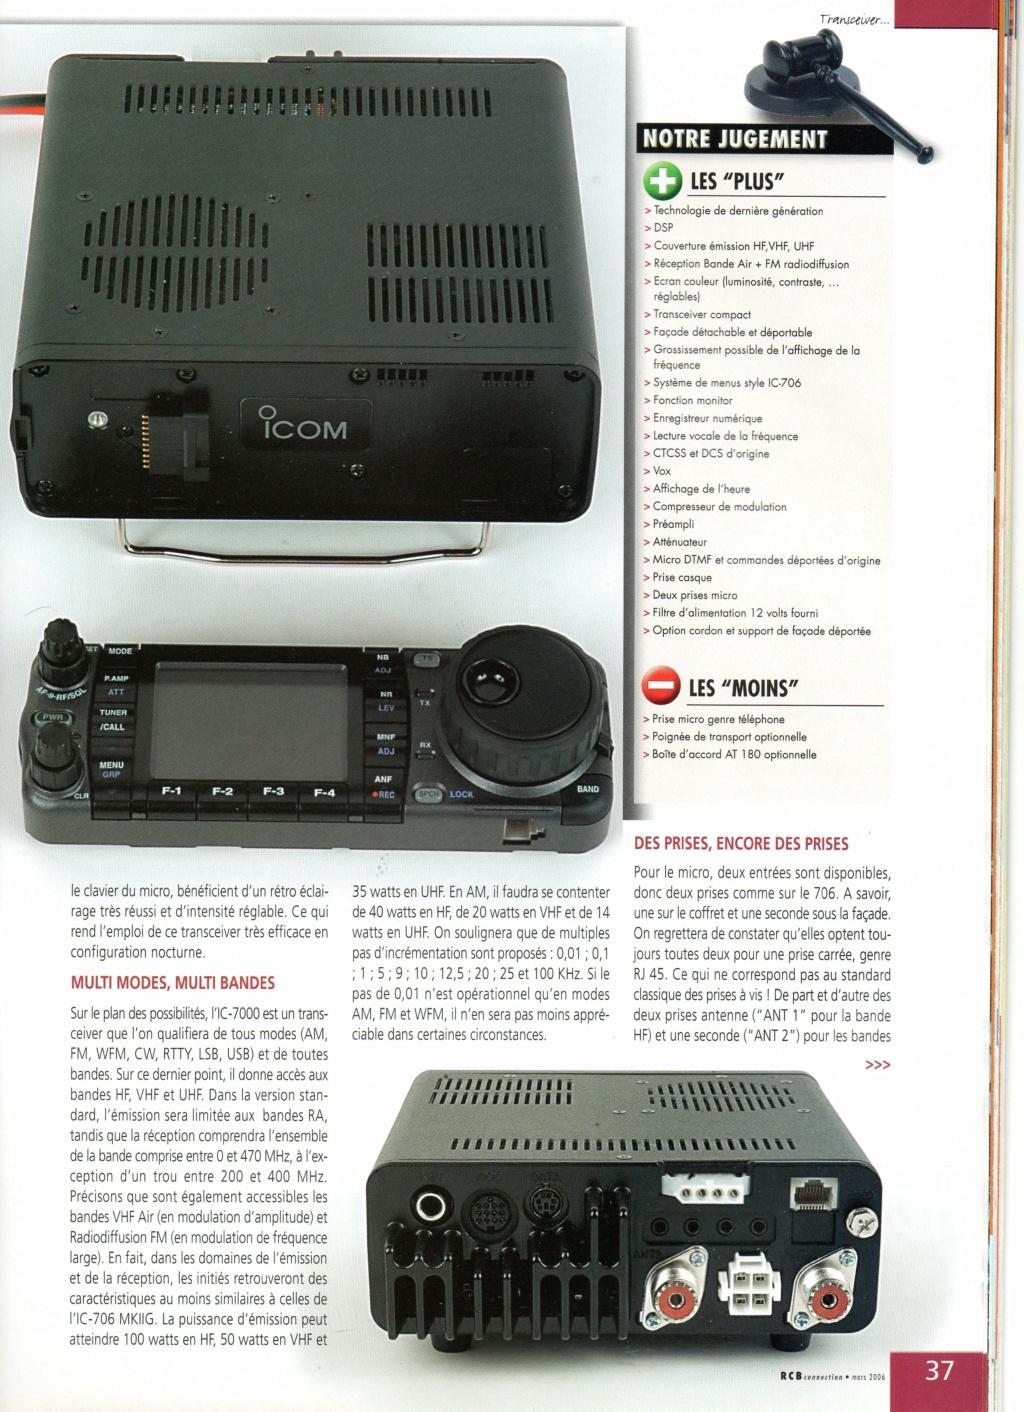 Icom IC-7000 Chora472